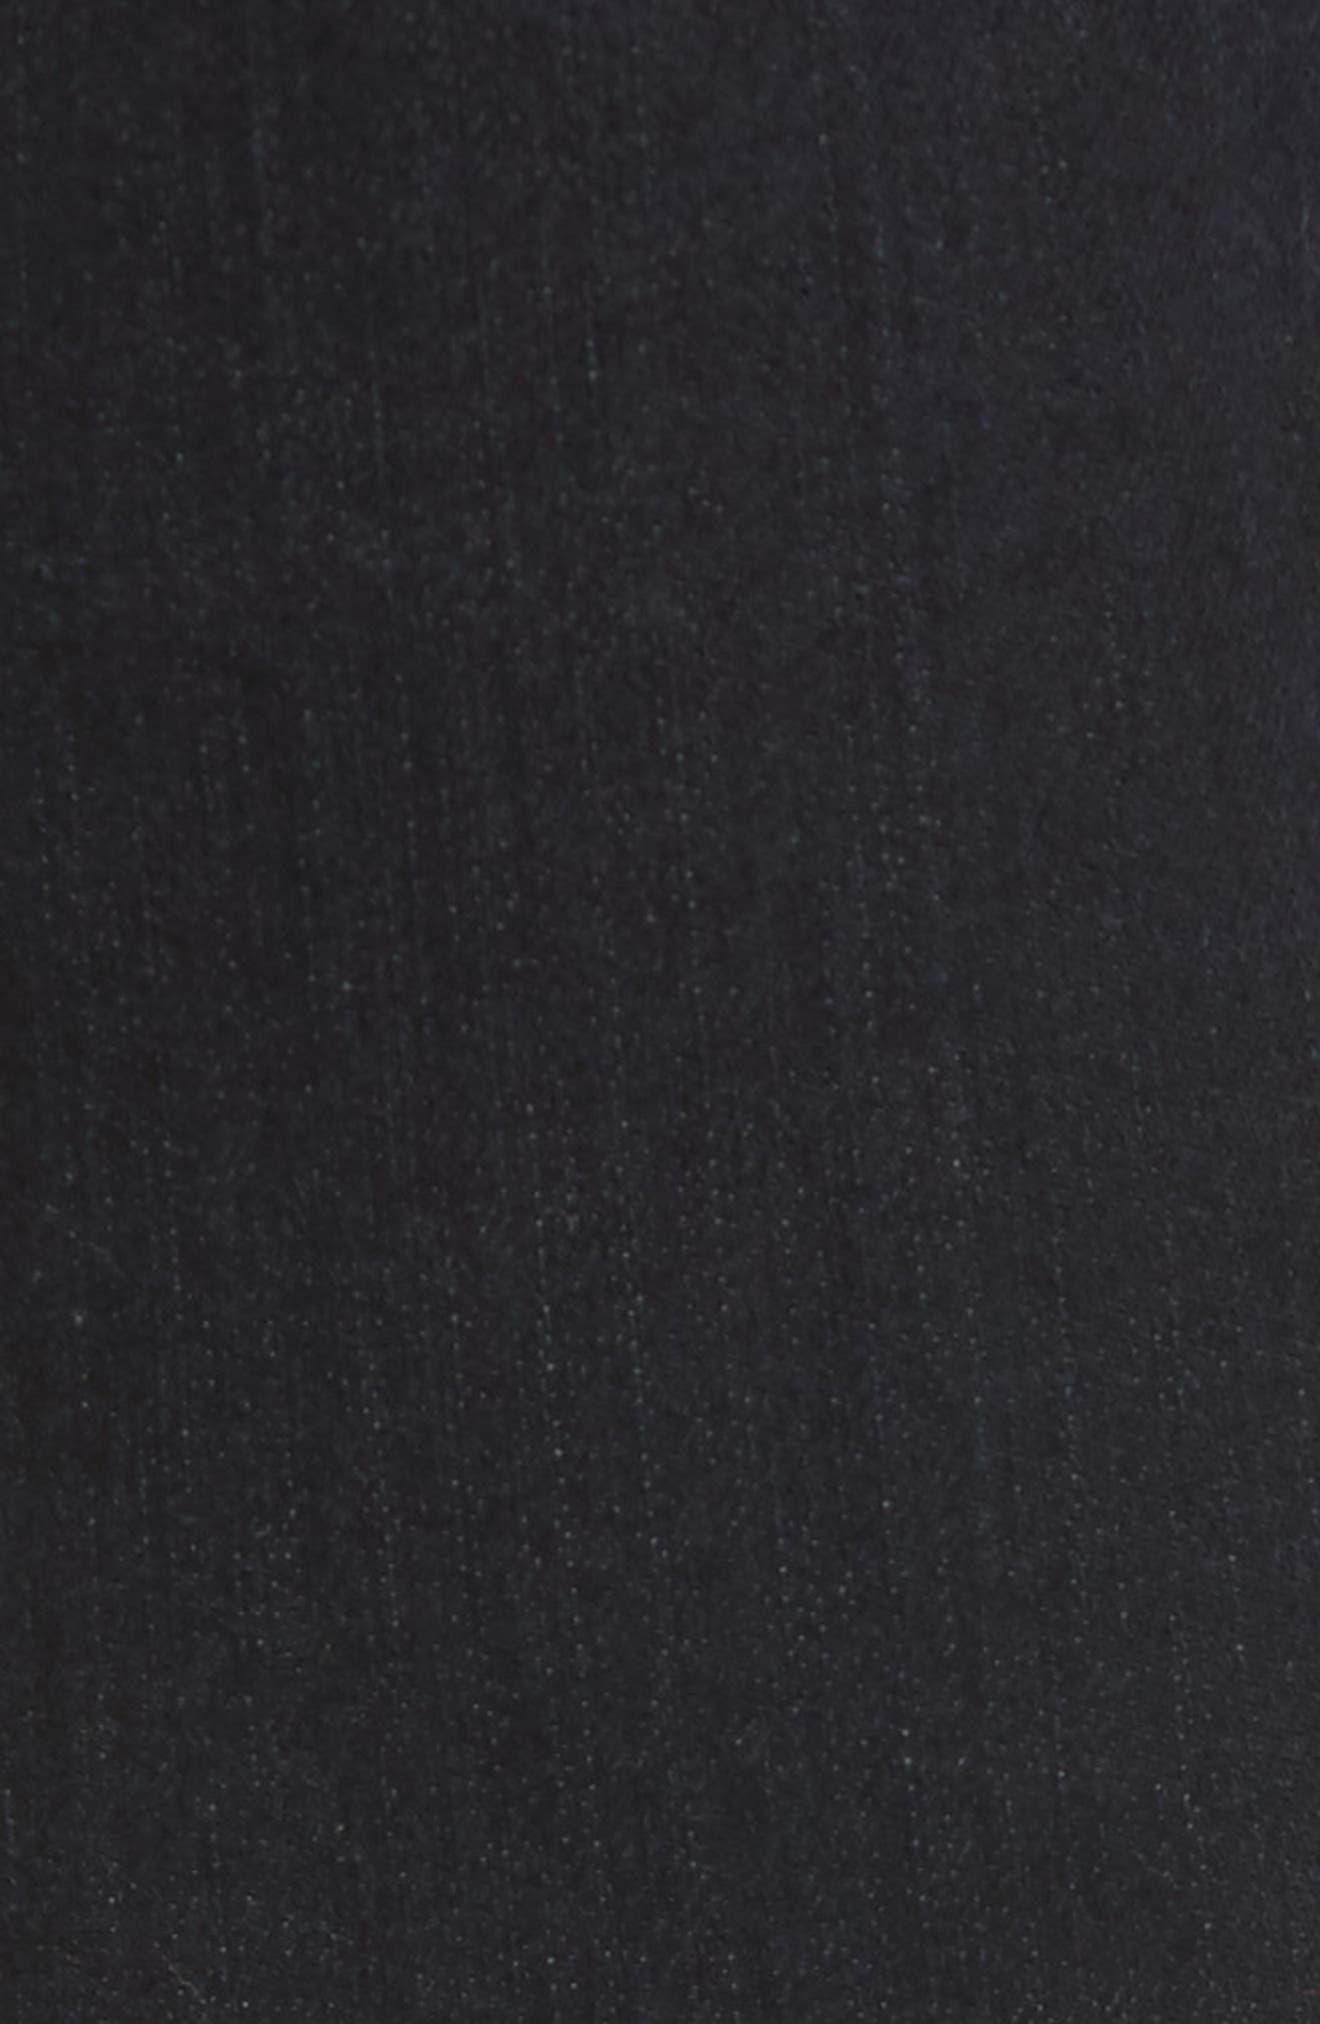 Lennox Slim Fit Jeans,                             Alternate thumbnail 5, color,                             Tommy